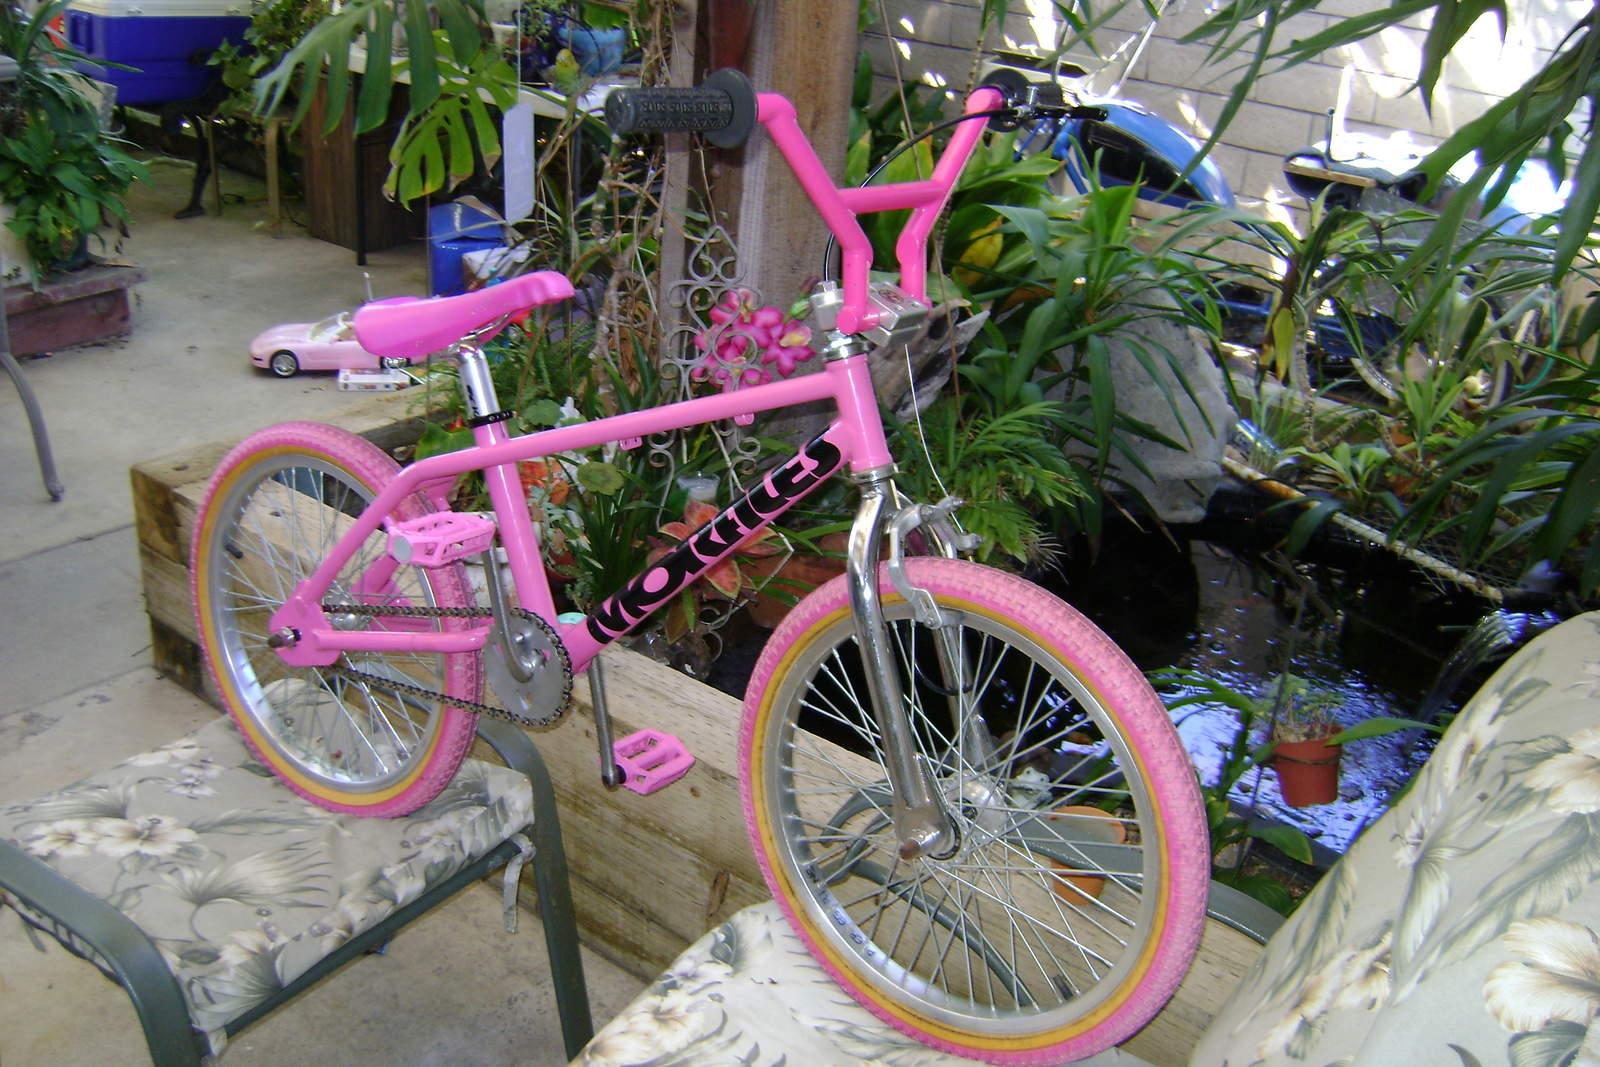 https://s3.amazonaws.com/uploads.bmxmuseum.com/user-images/6905/bikes-freestyle-0185968fa8bcf.jpg